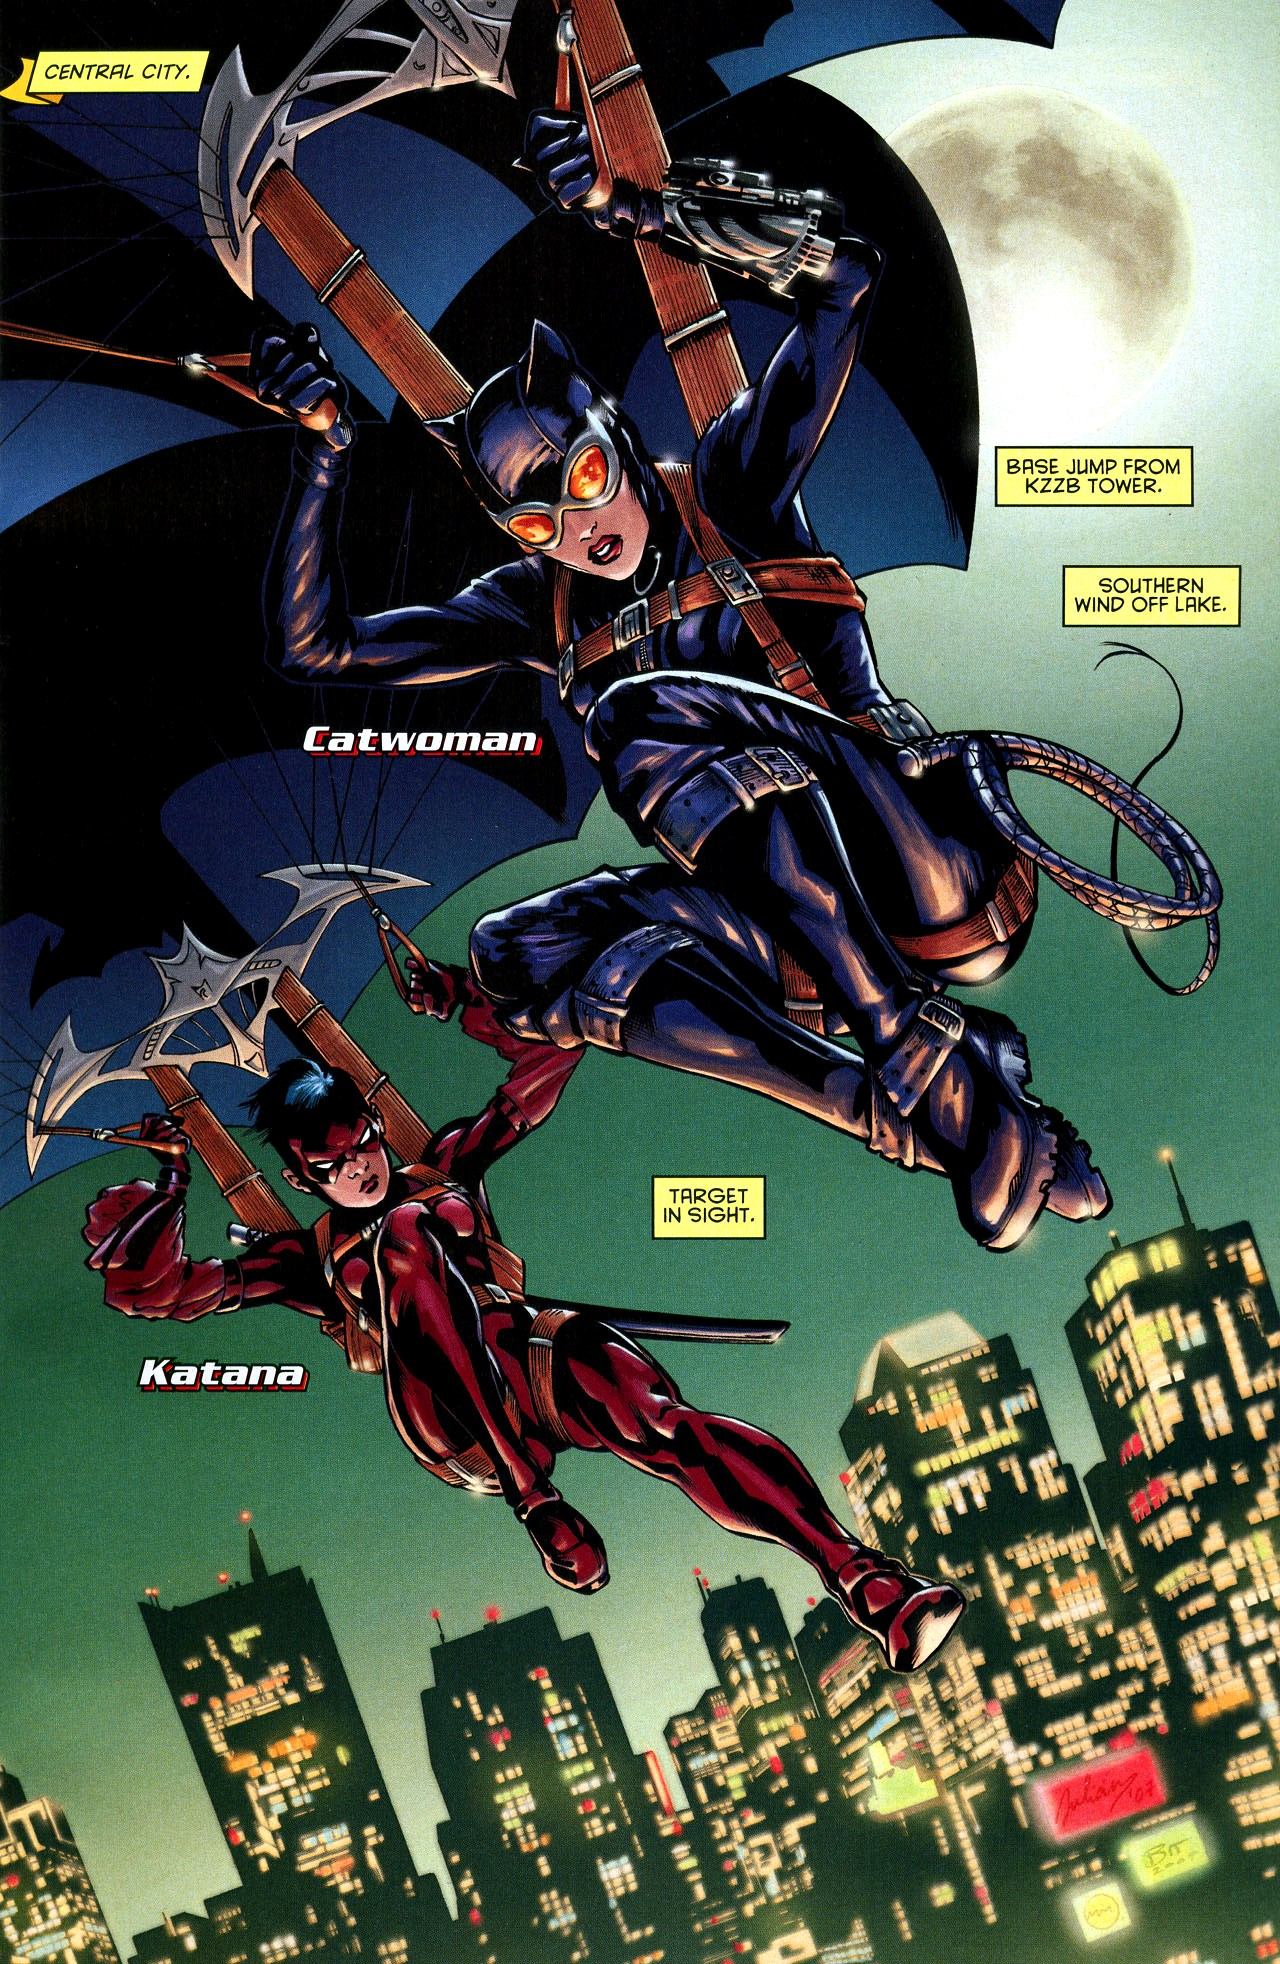 Catwoman 0122.jpg